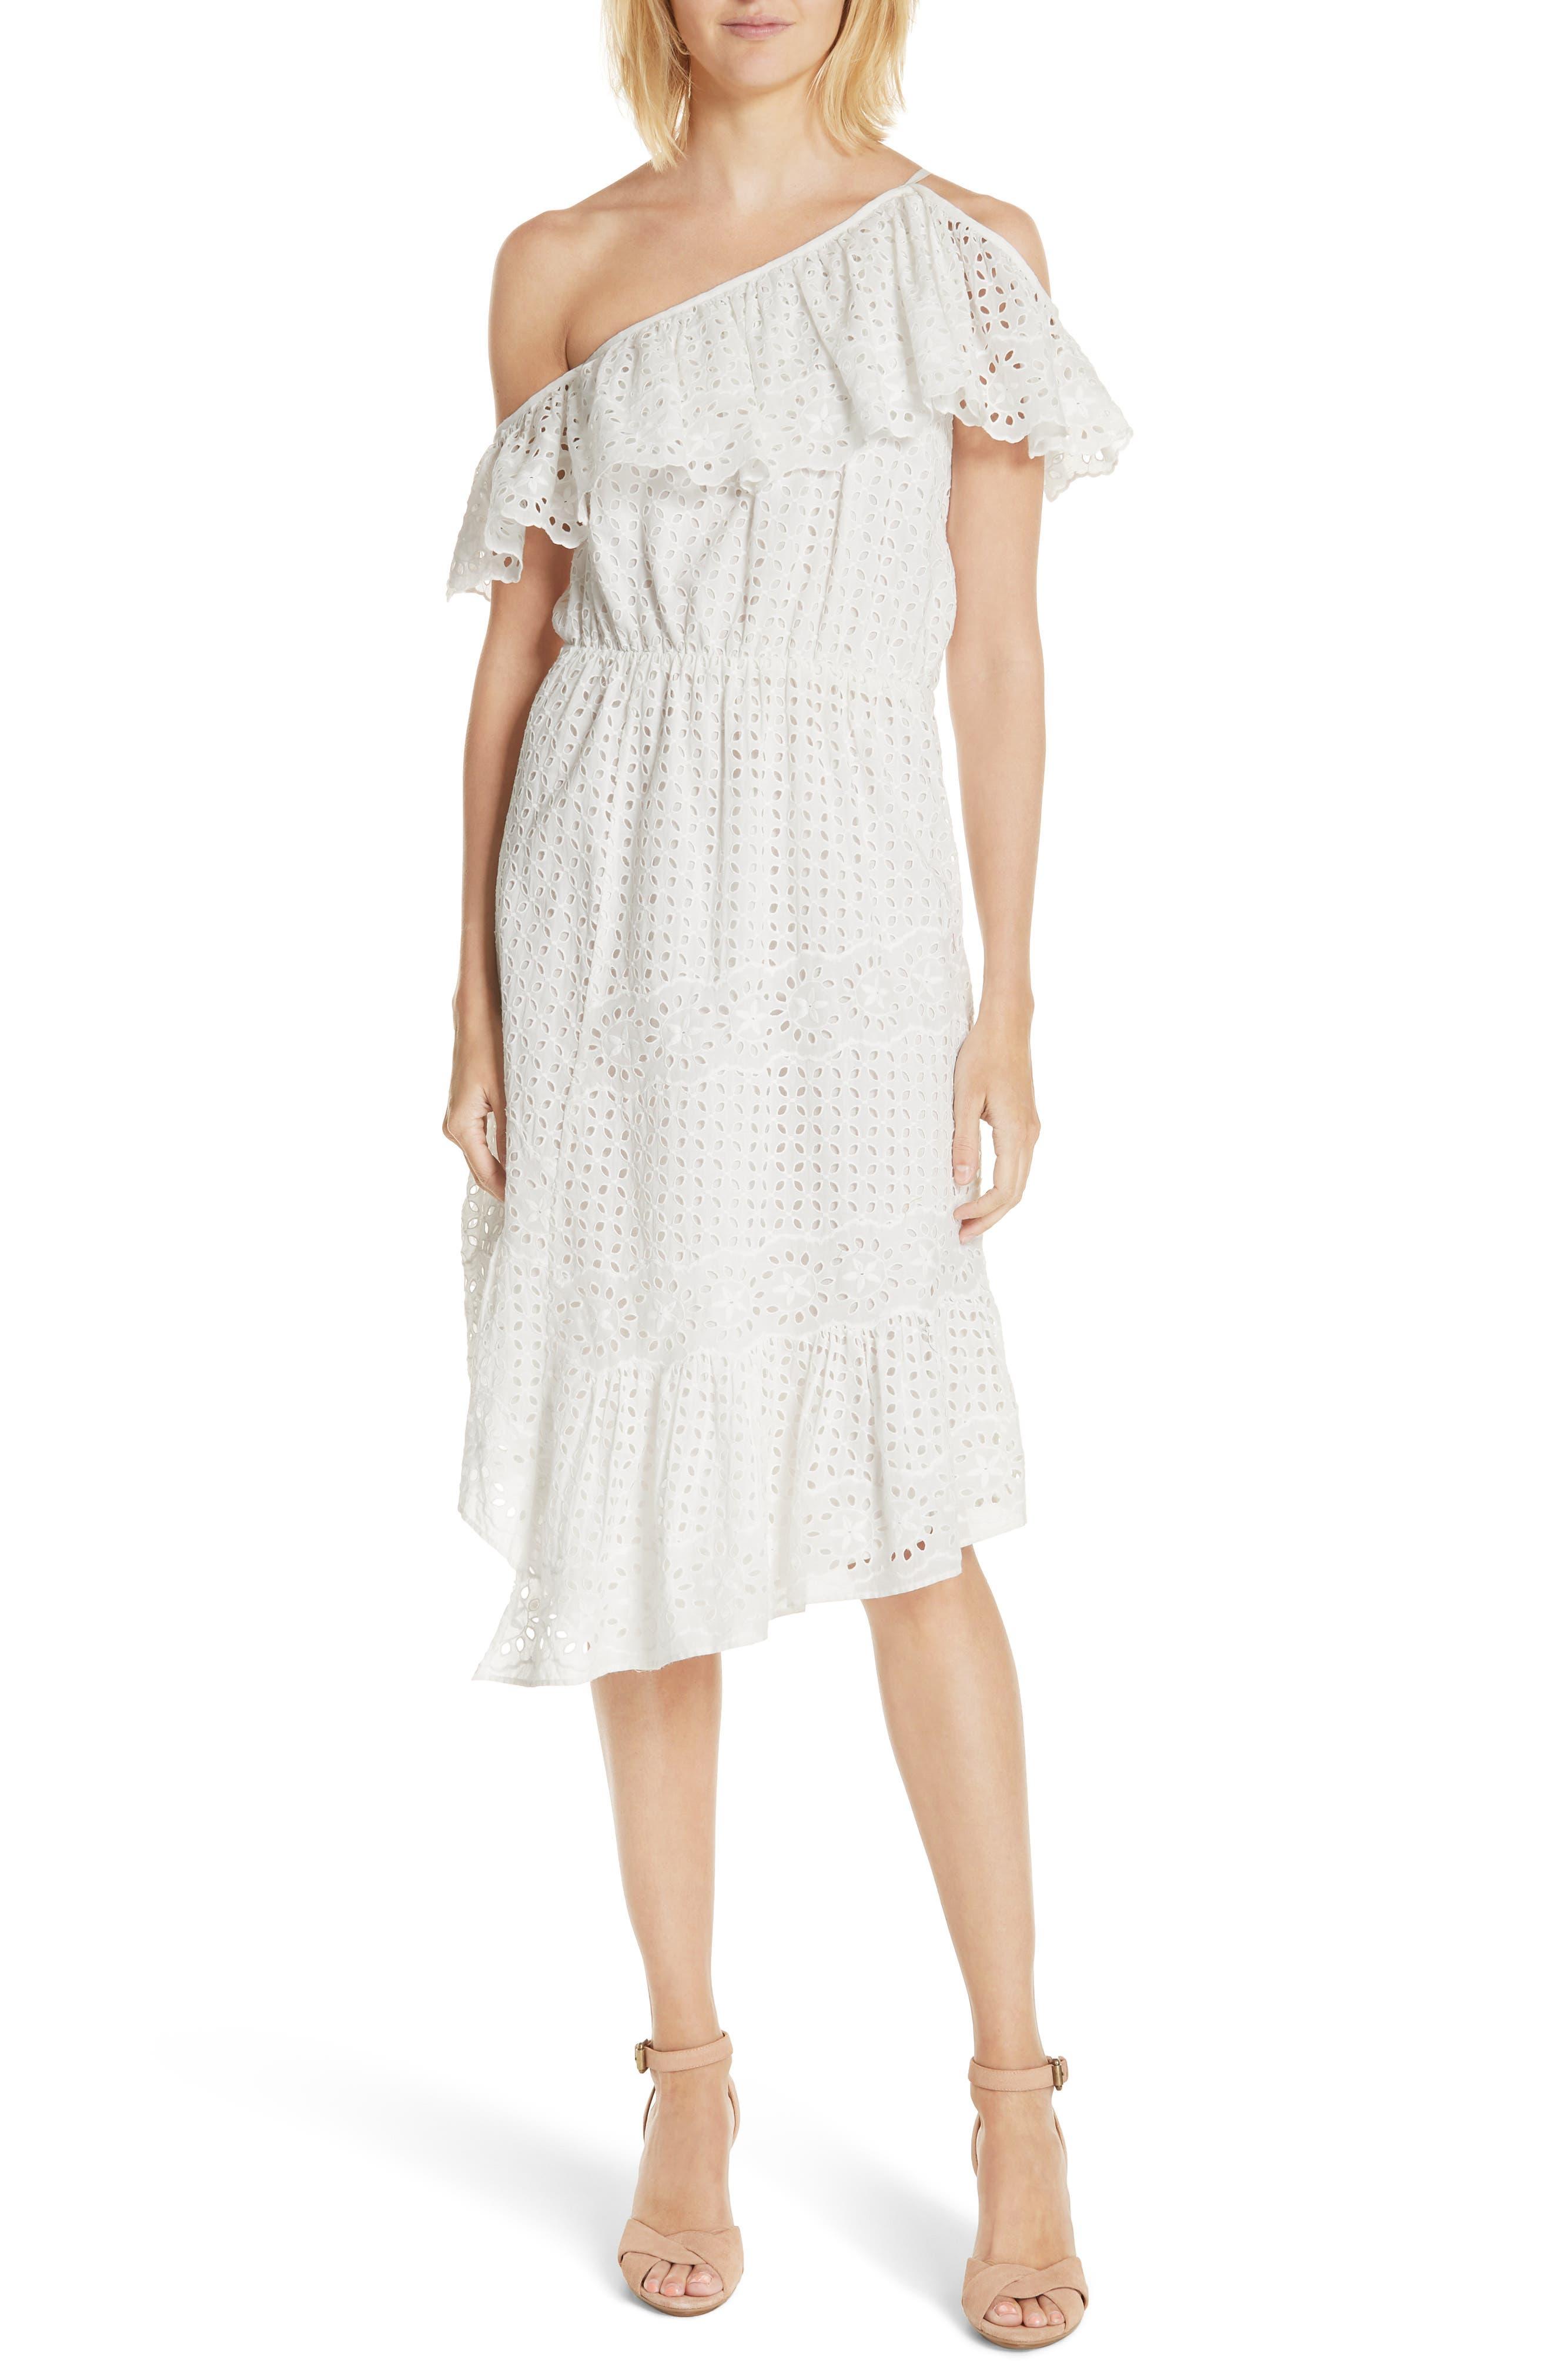 Joie Corynn Eyelet Dress